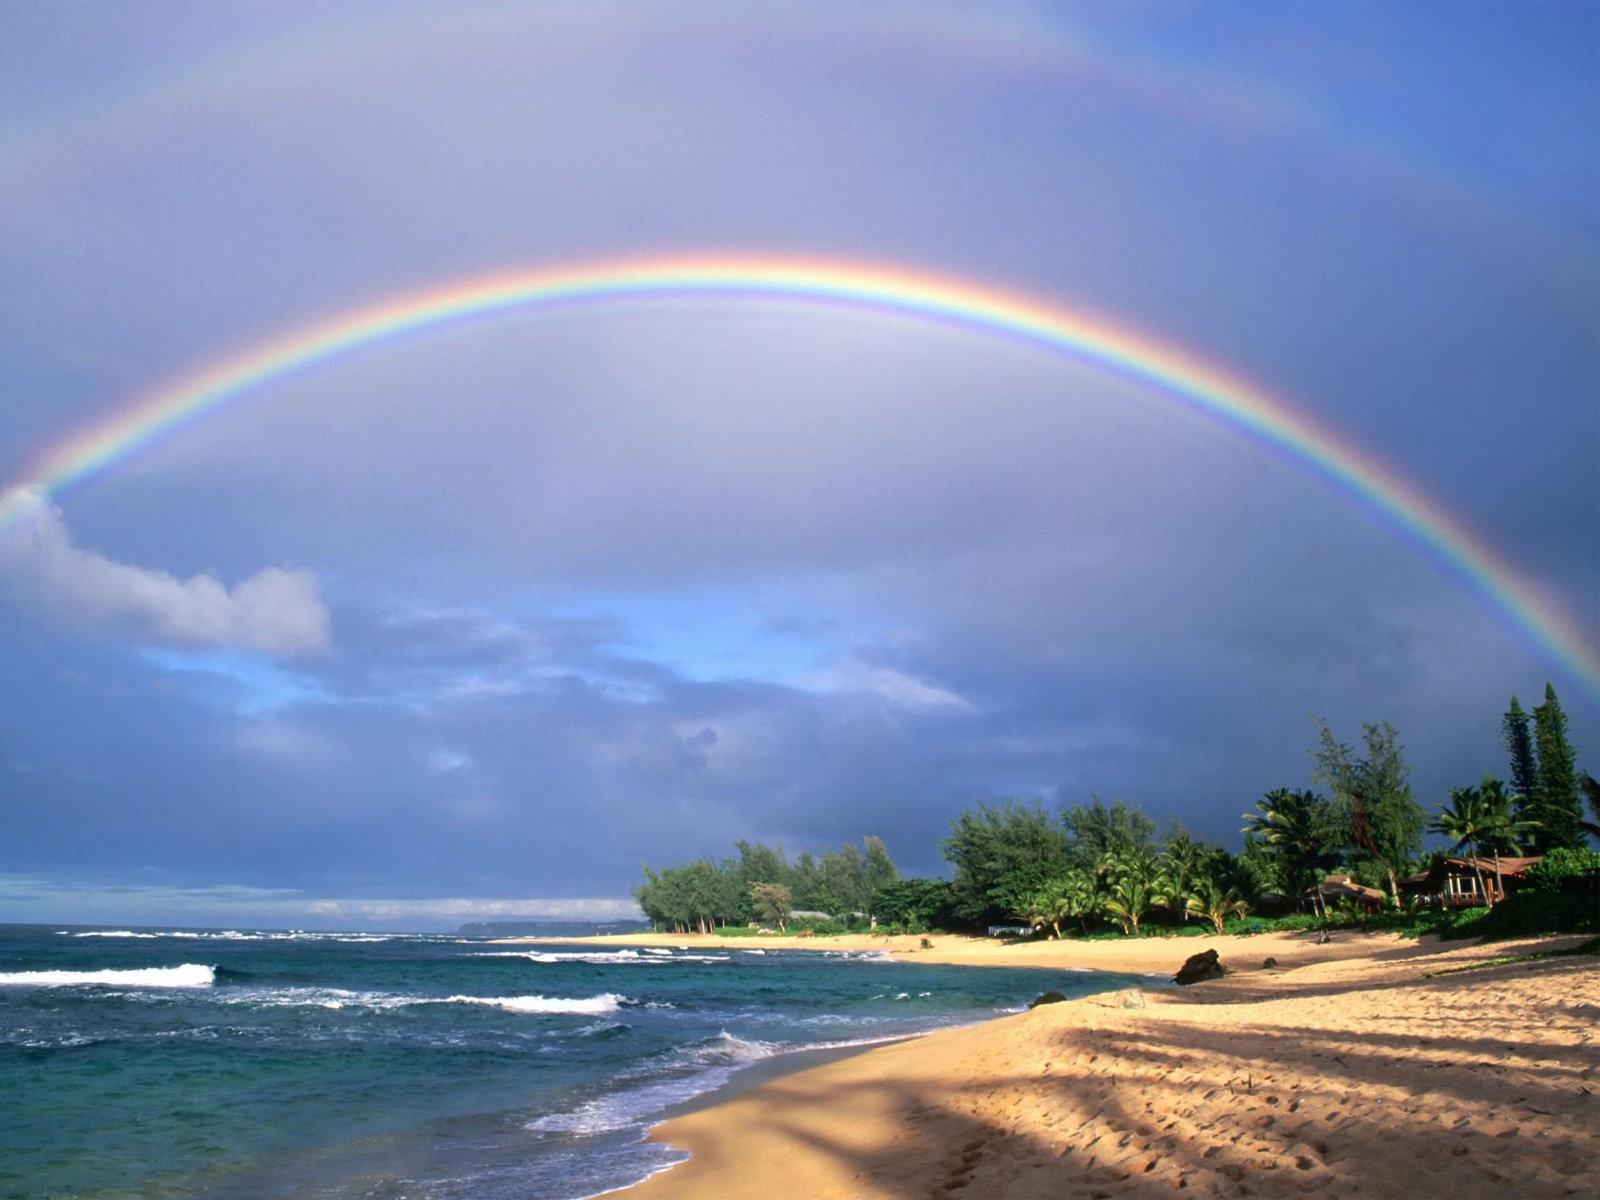 Oh the Beautiful Rainbow!